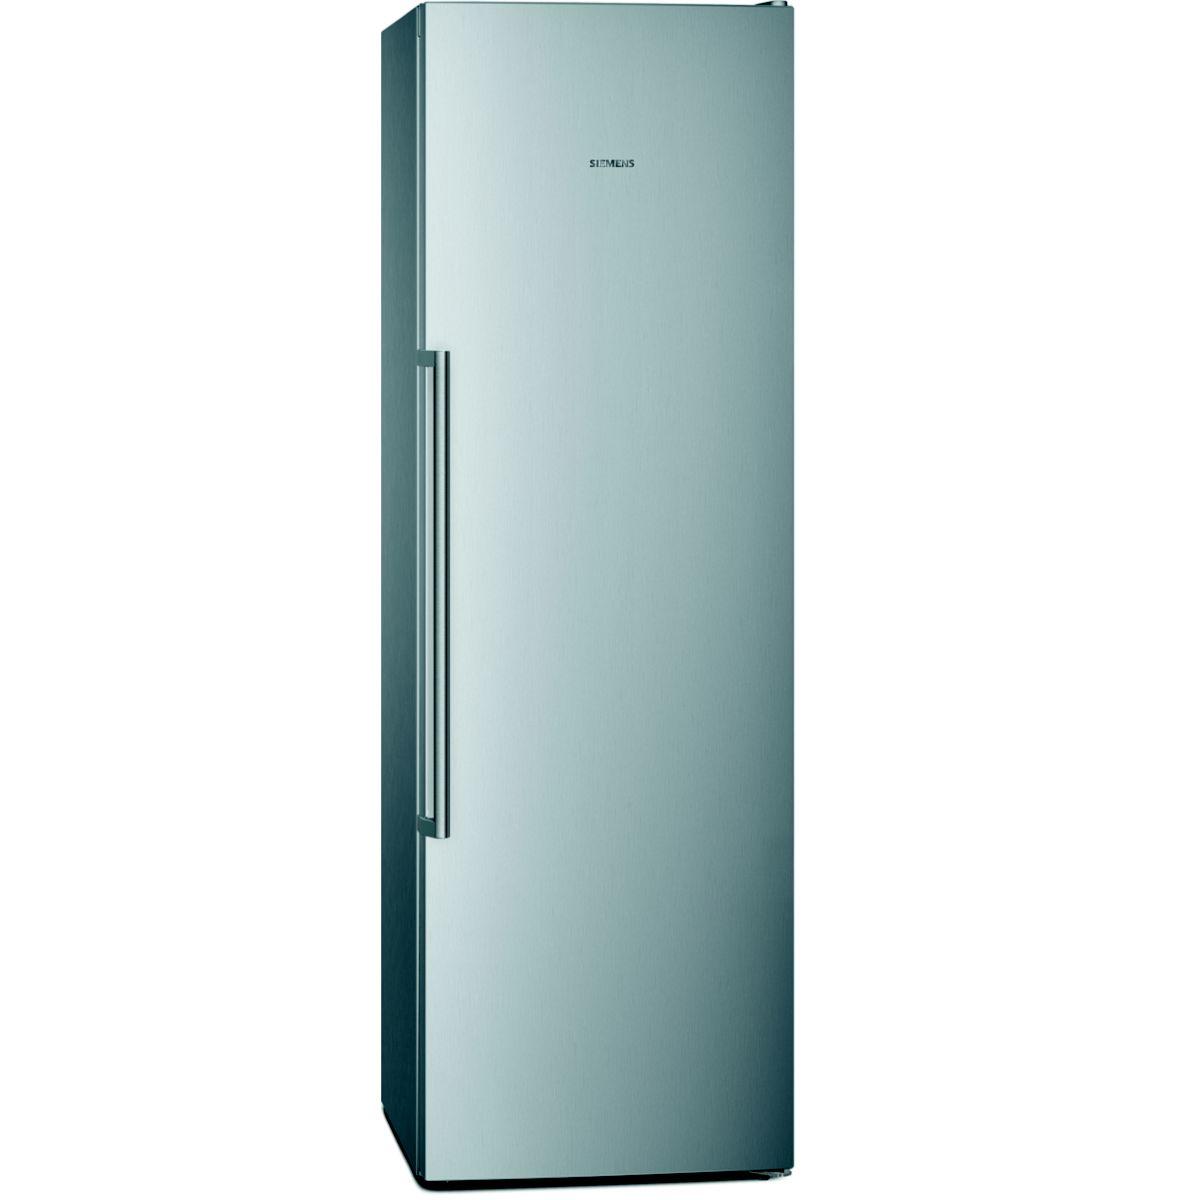 Siemens gs36nai31 cong lateur armoire 237 litres comparer avec touslespri - Congelateur armoire 120 litres ...